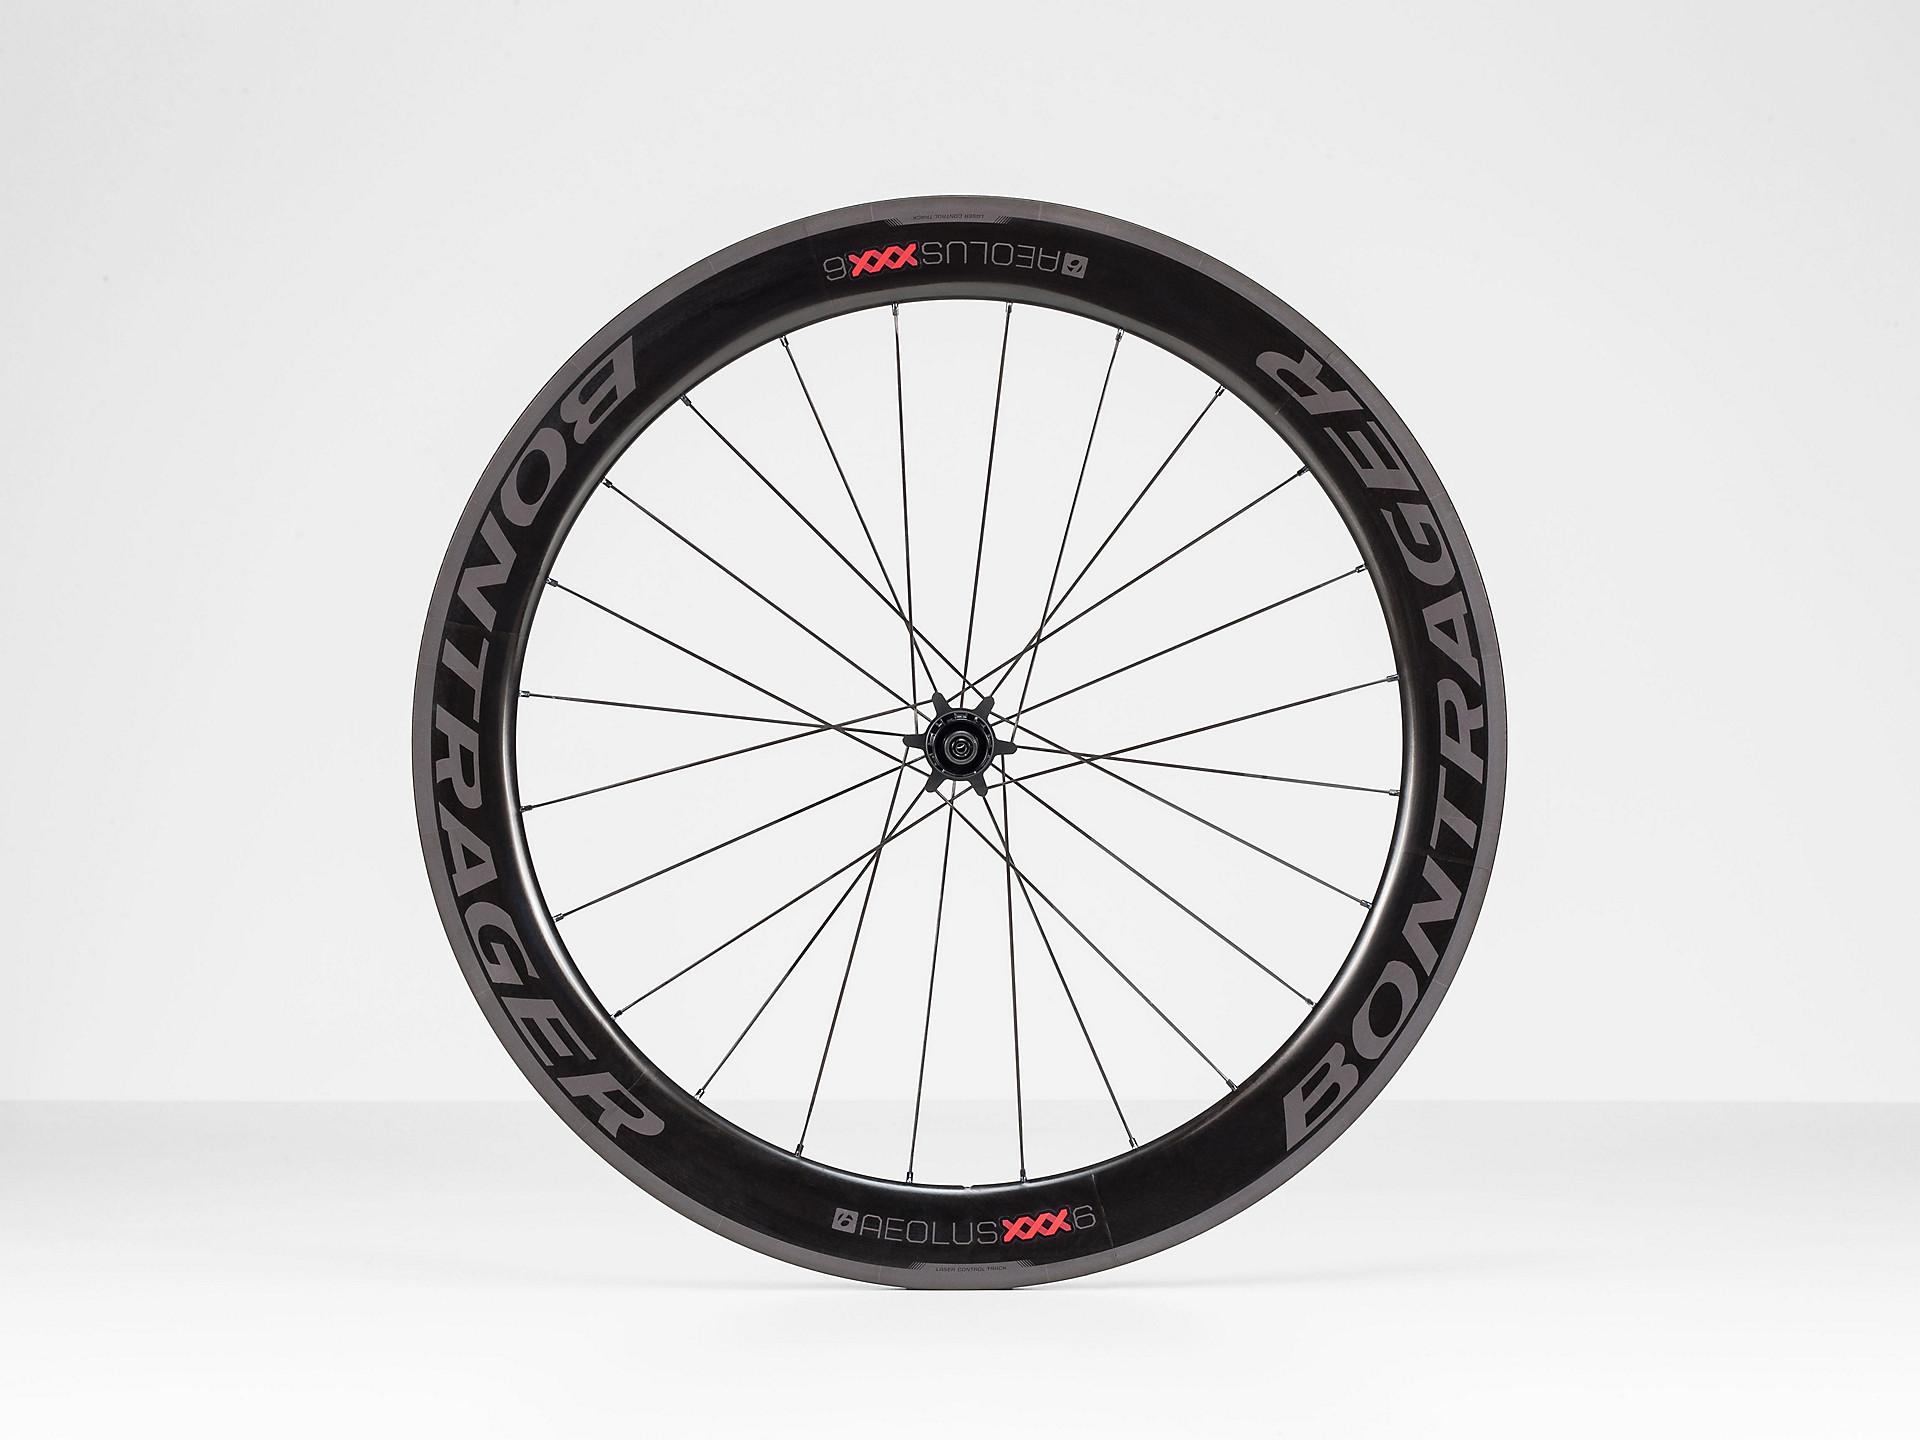 Bontrager Aeolus XXX 6 Tubular Road bike Wheel